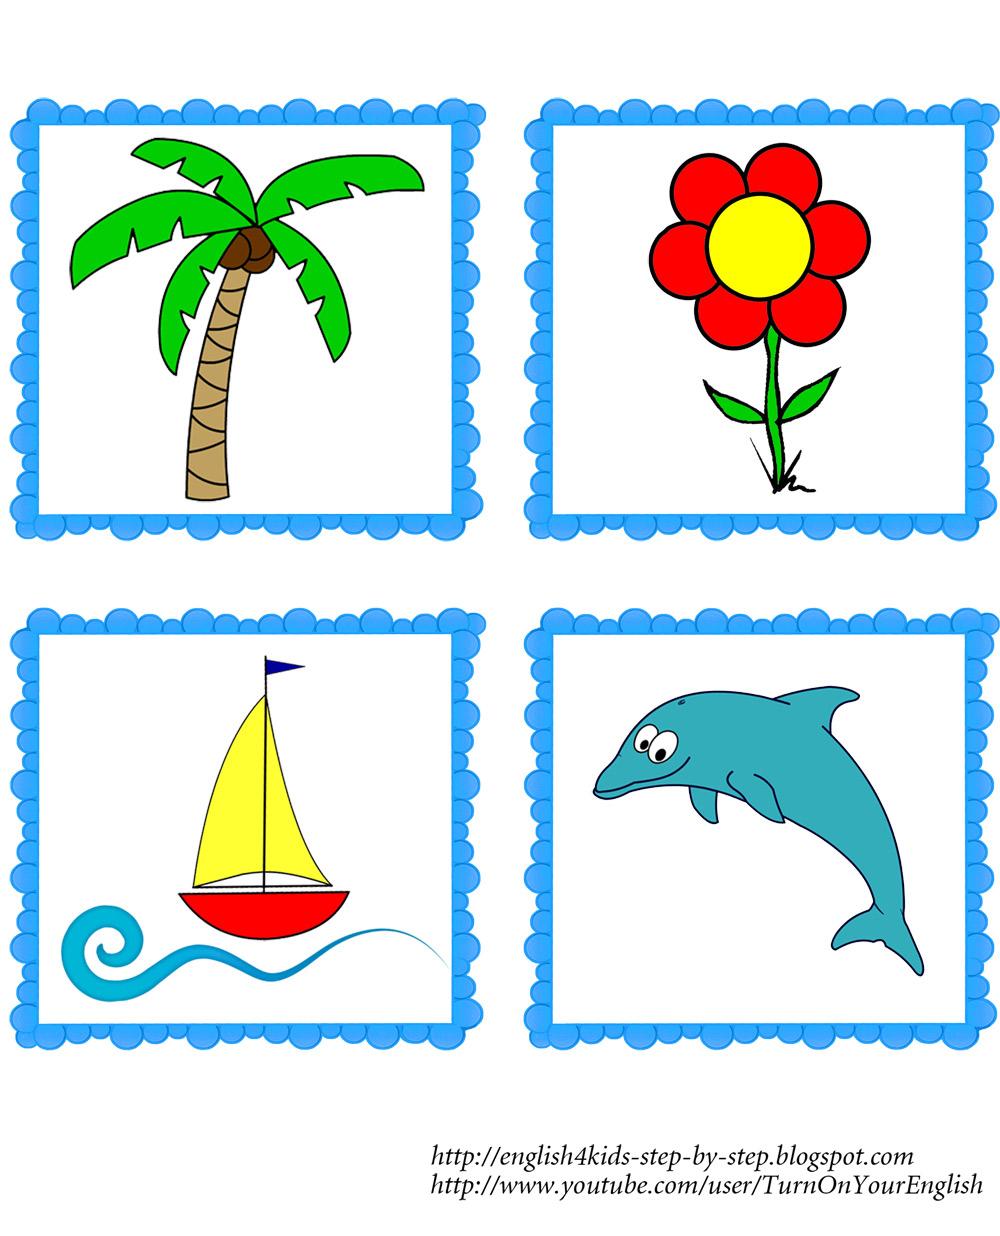 Карточки по английскому алфавиту с картинками 16